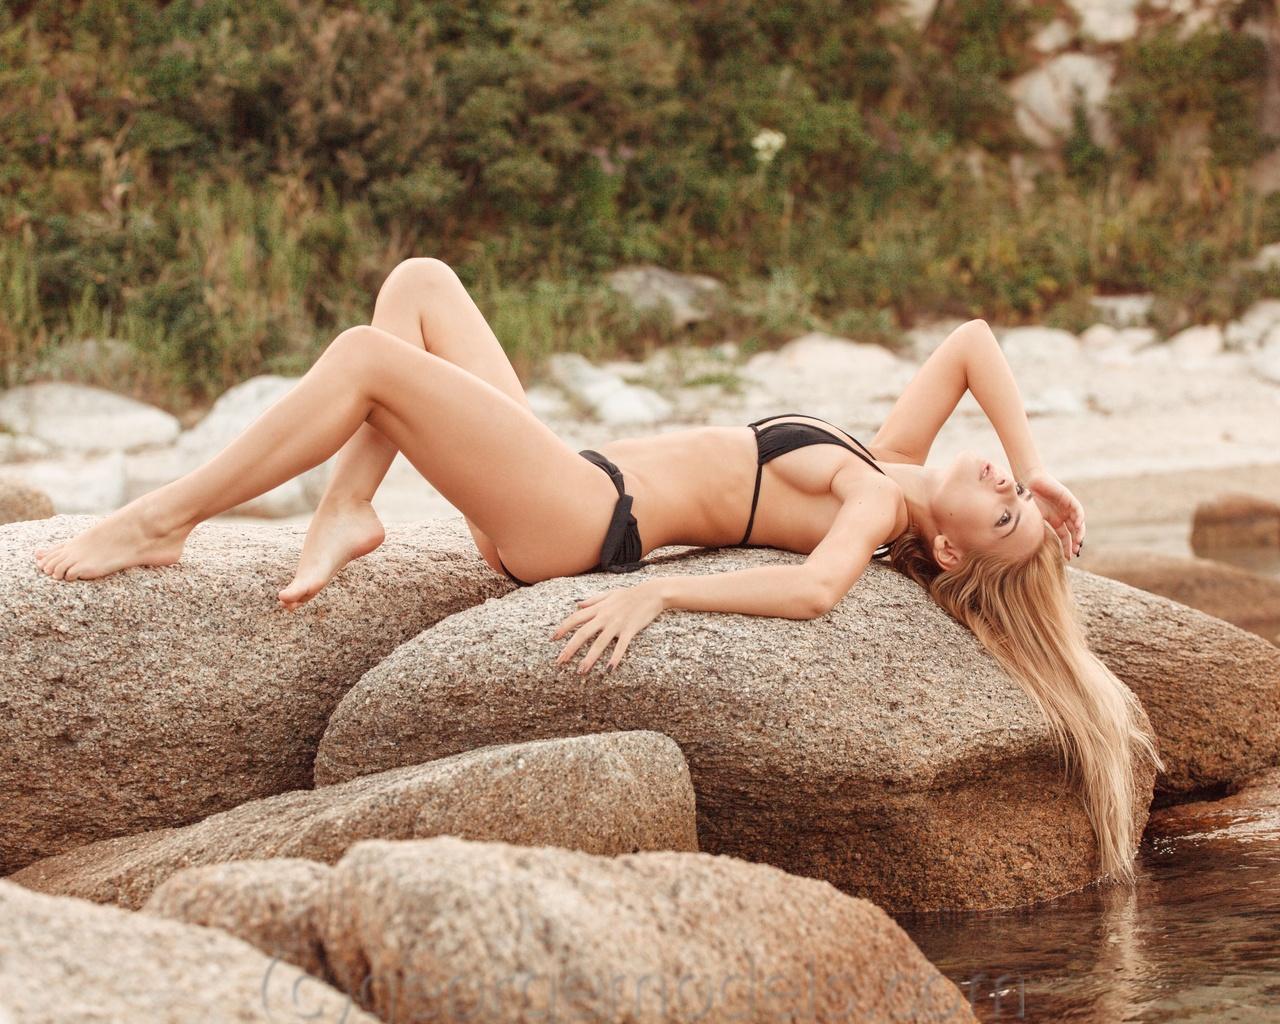 tatyana georgieva, девушка, модель, блондинка